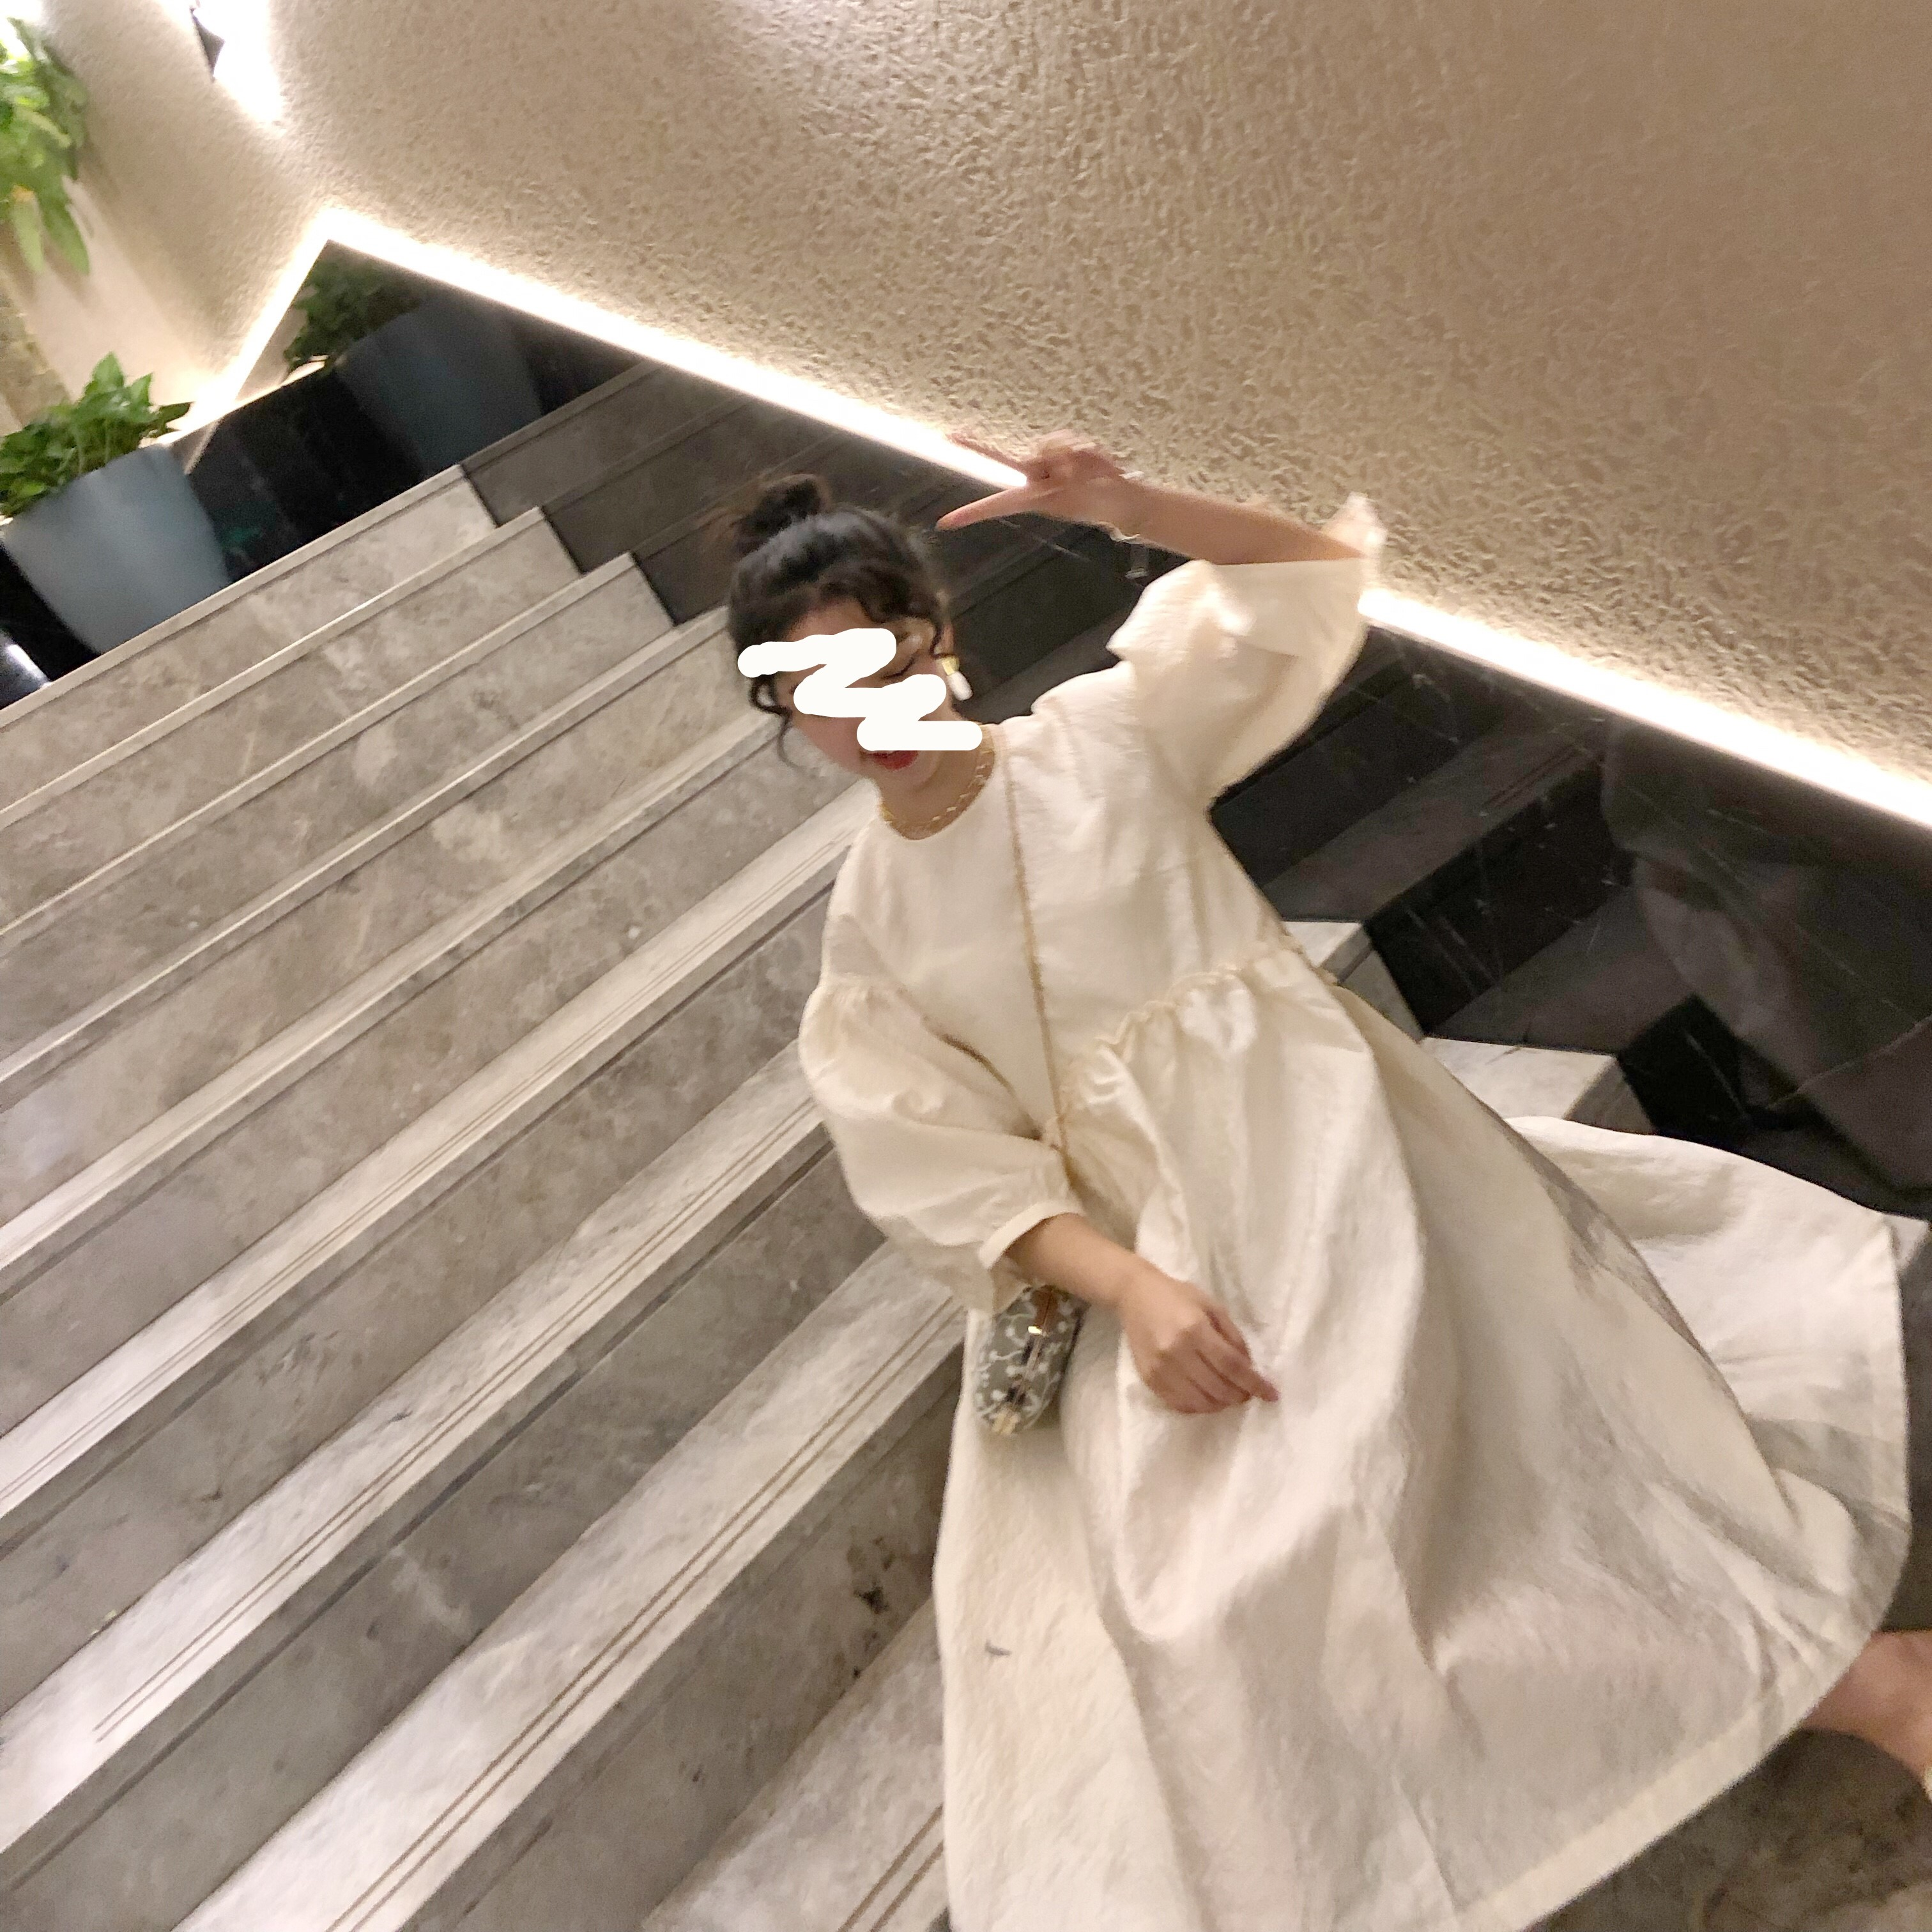 【13C】公主宽松宫廷中长款A字圆领袖泡泡裙19夏季新款连衣裙HD52